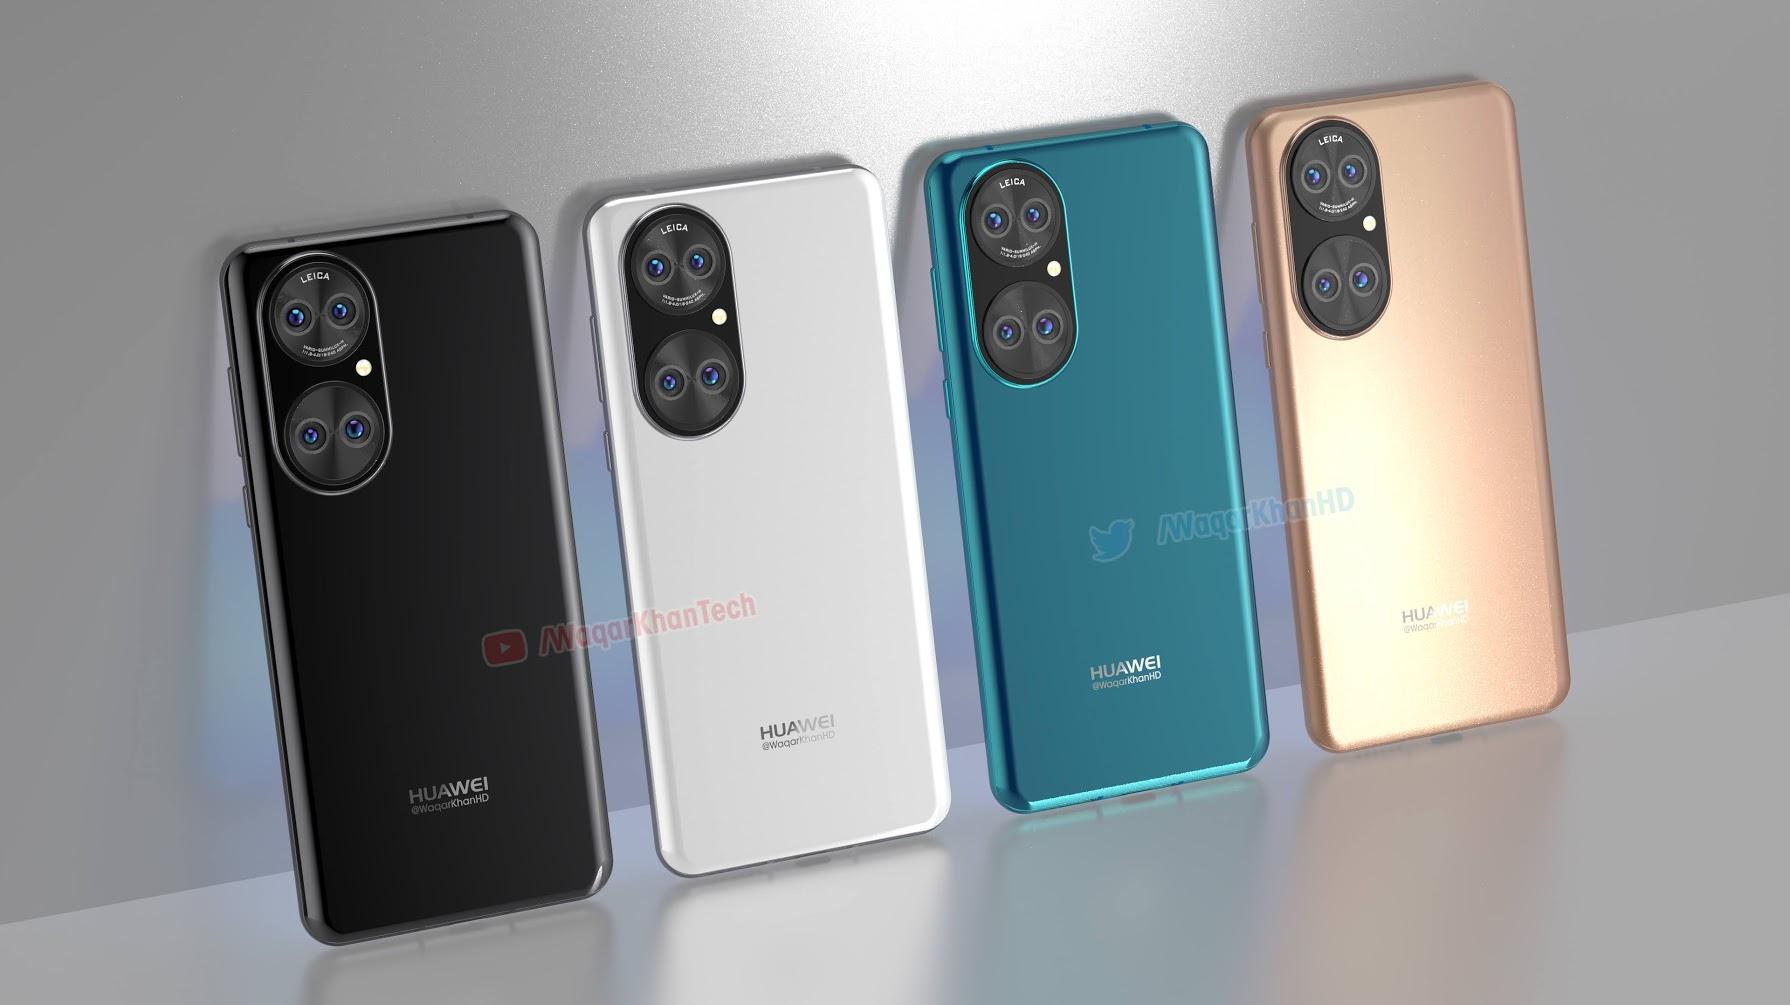 Качественные макеты Huawei P50 Huawei  - huawei_p50_pokazalsa_na_realistichnyh_renederah_video_picture6_0